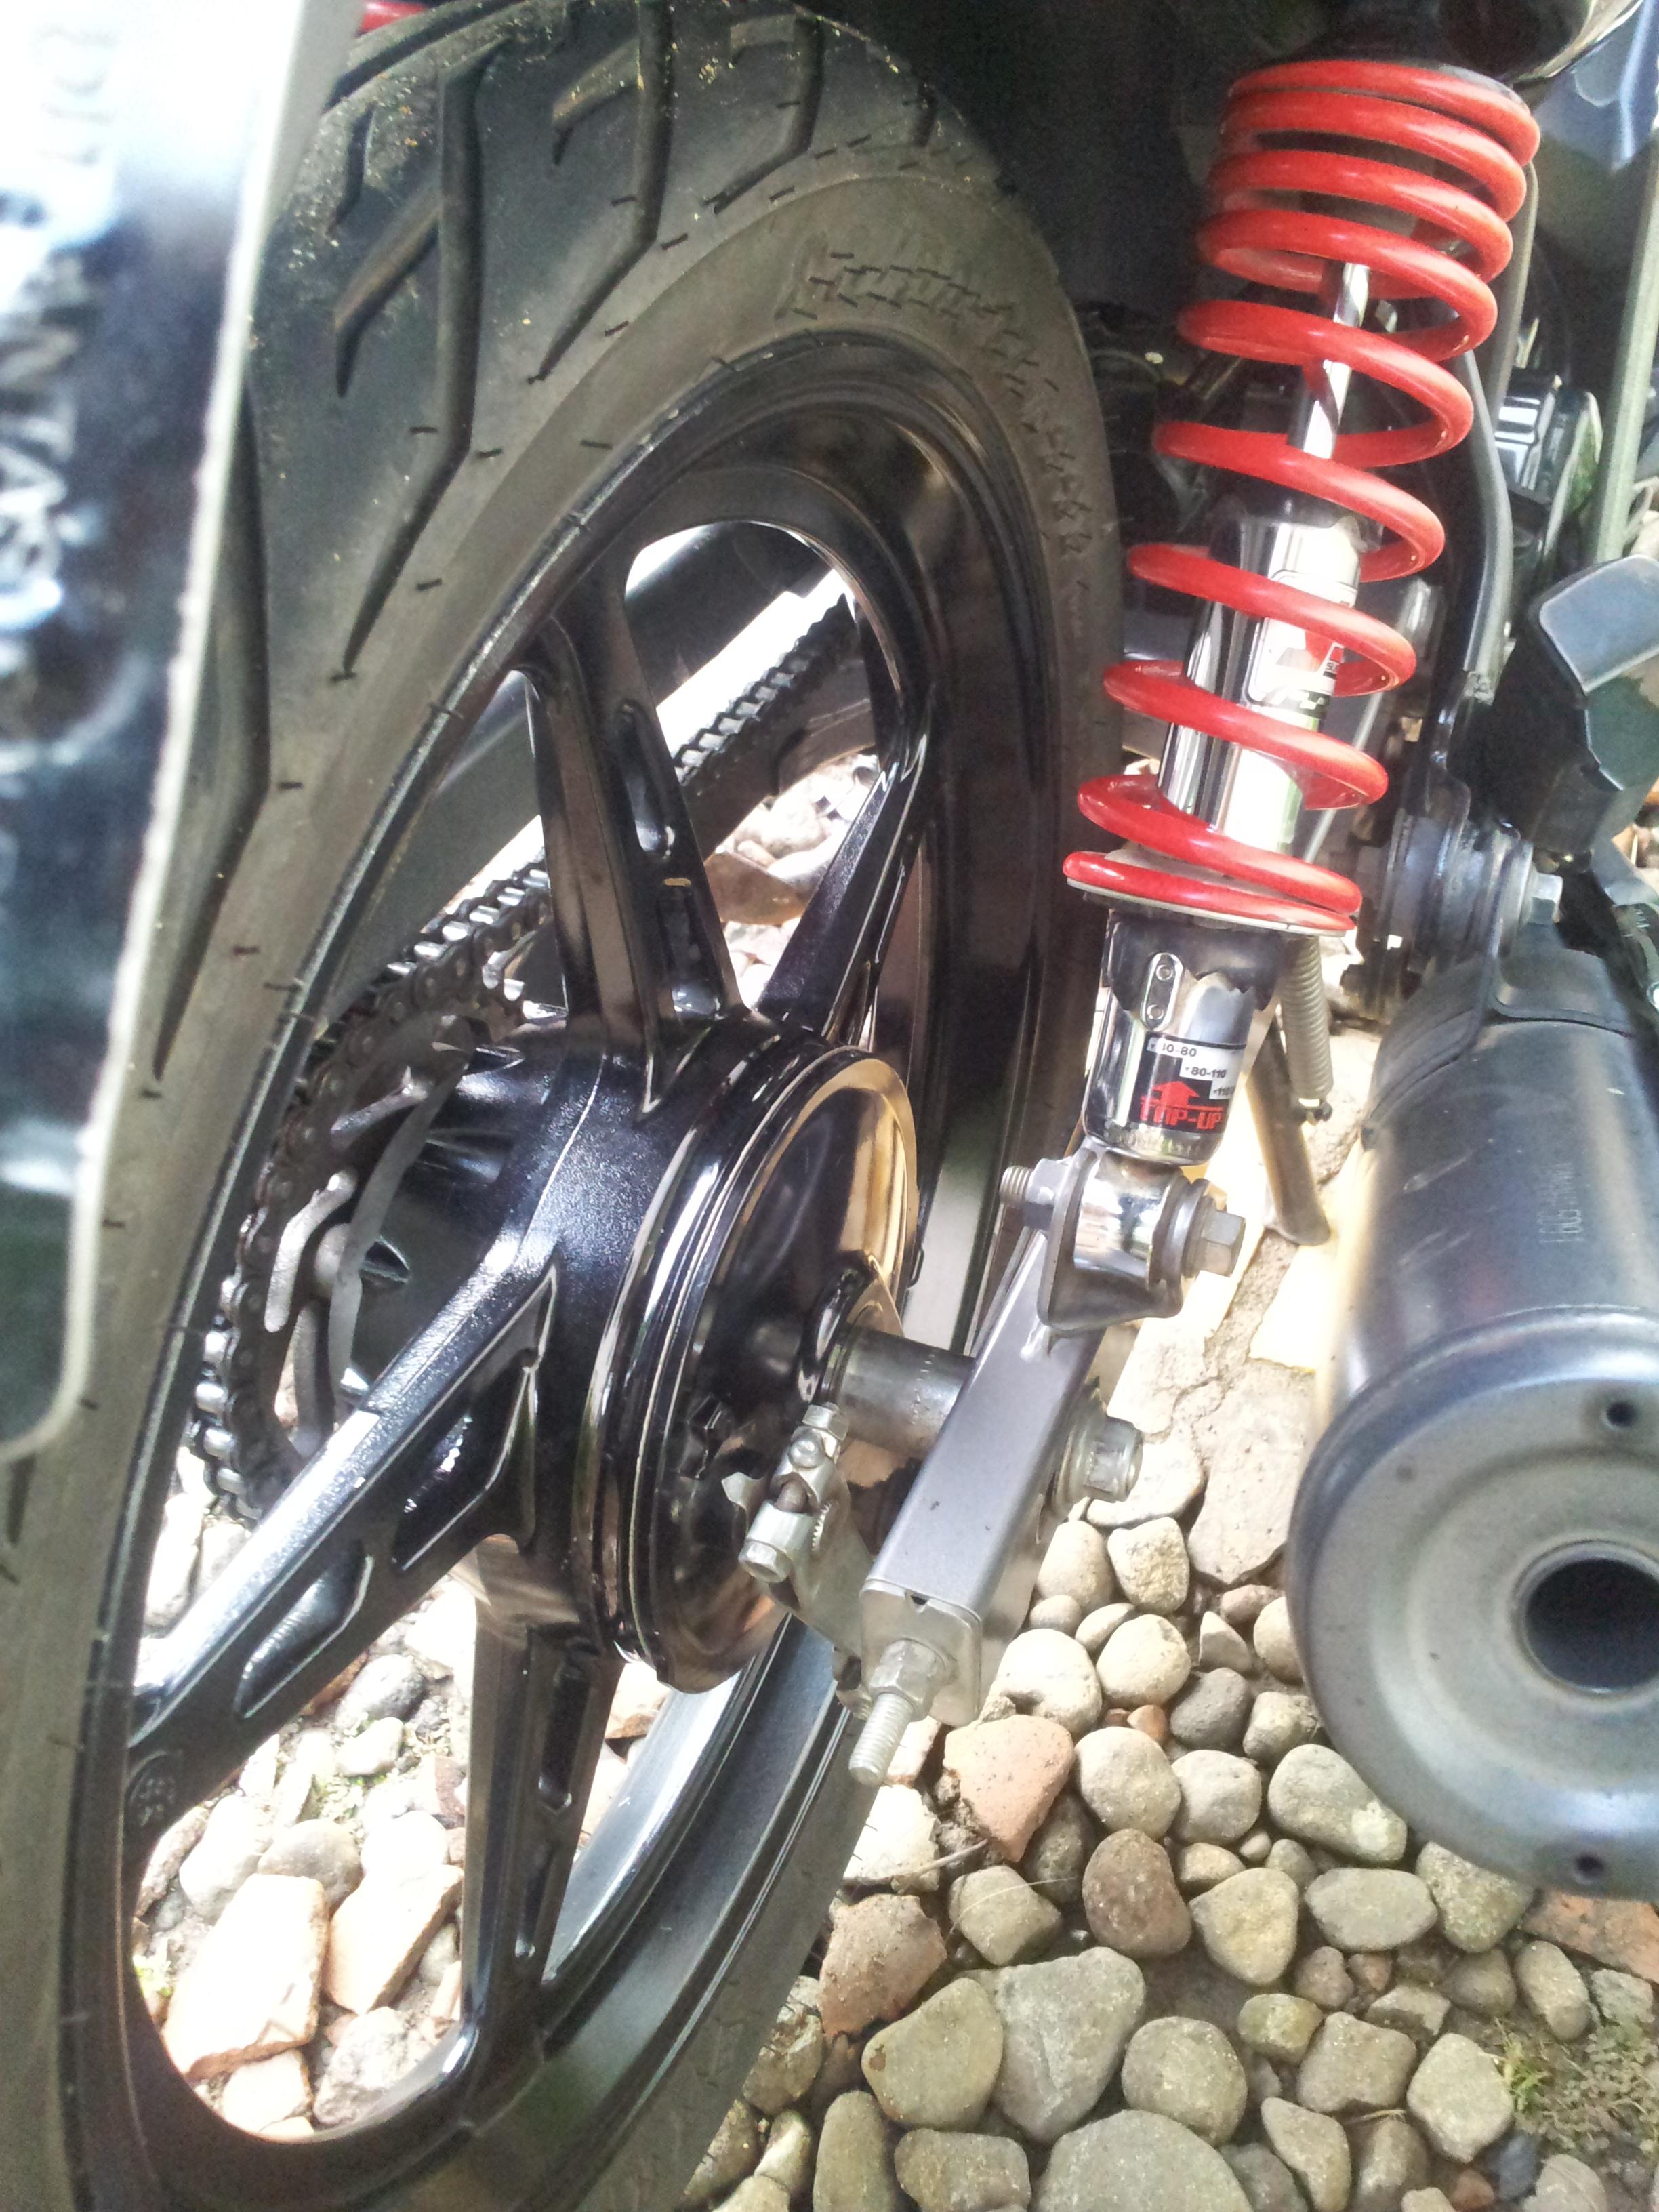 Ganti Swing Arm Vega ZR Dengan Swing Arm Jupiter Z1 Depmoto Blog